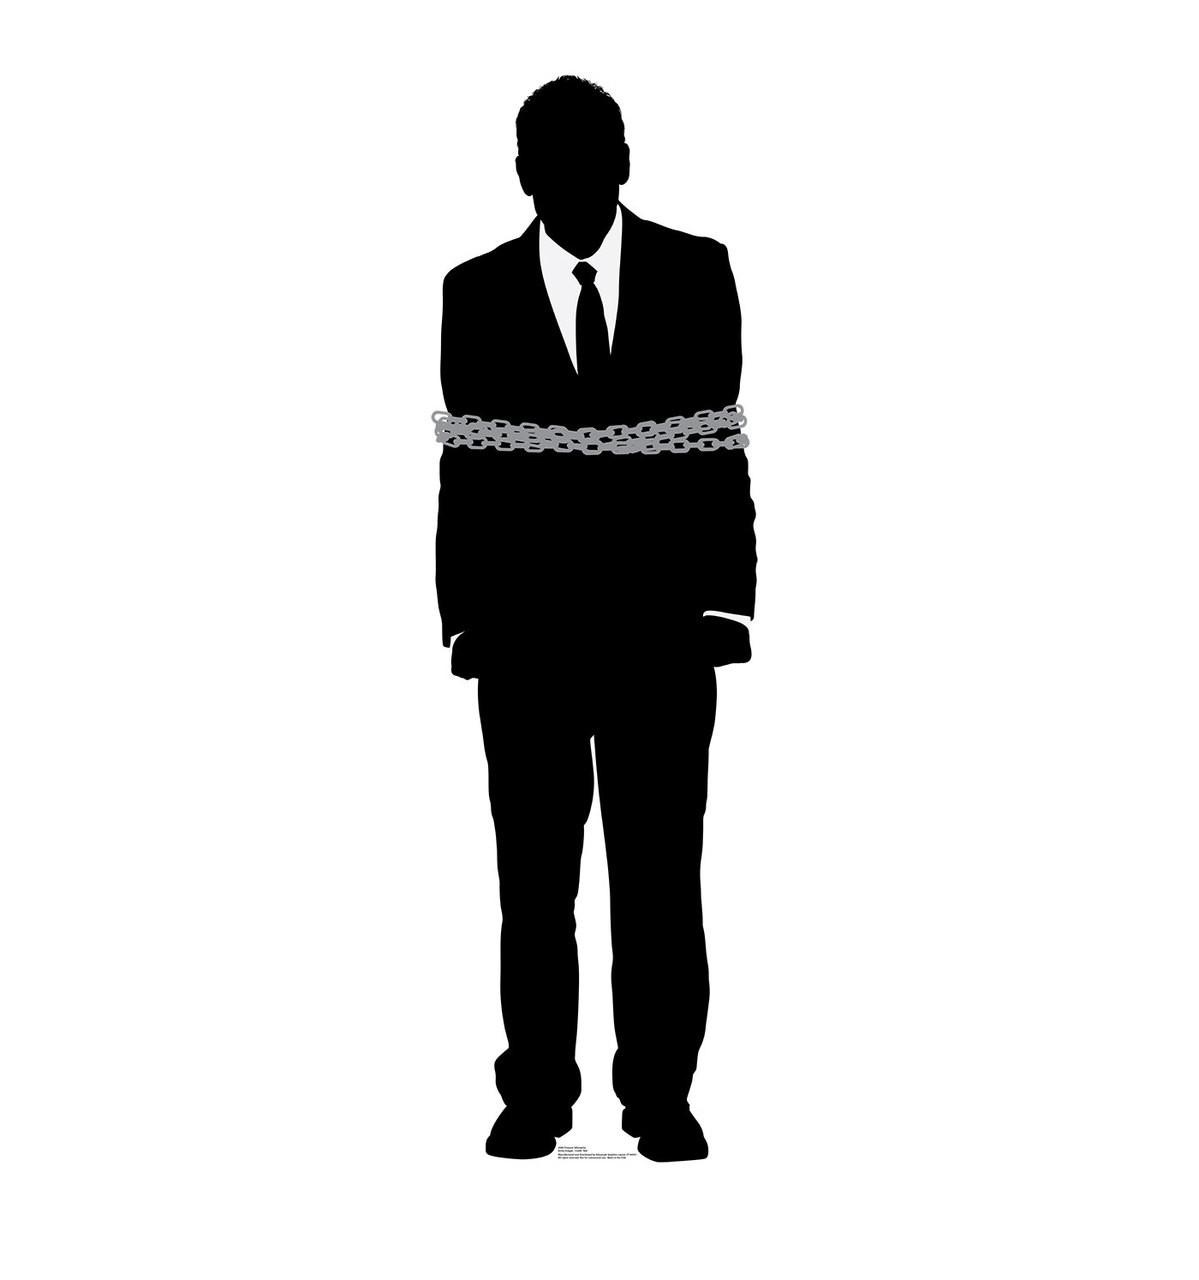 Life-size Prisoner Silhouette Cardboard Standup